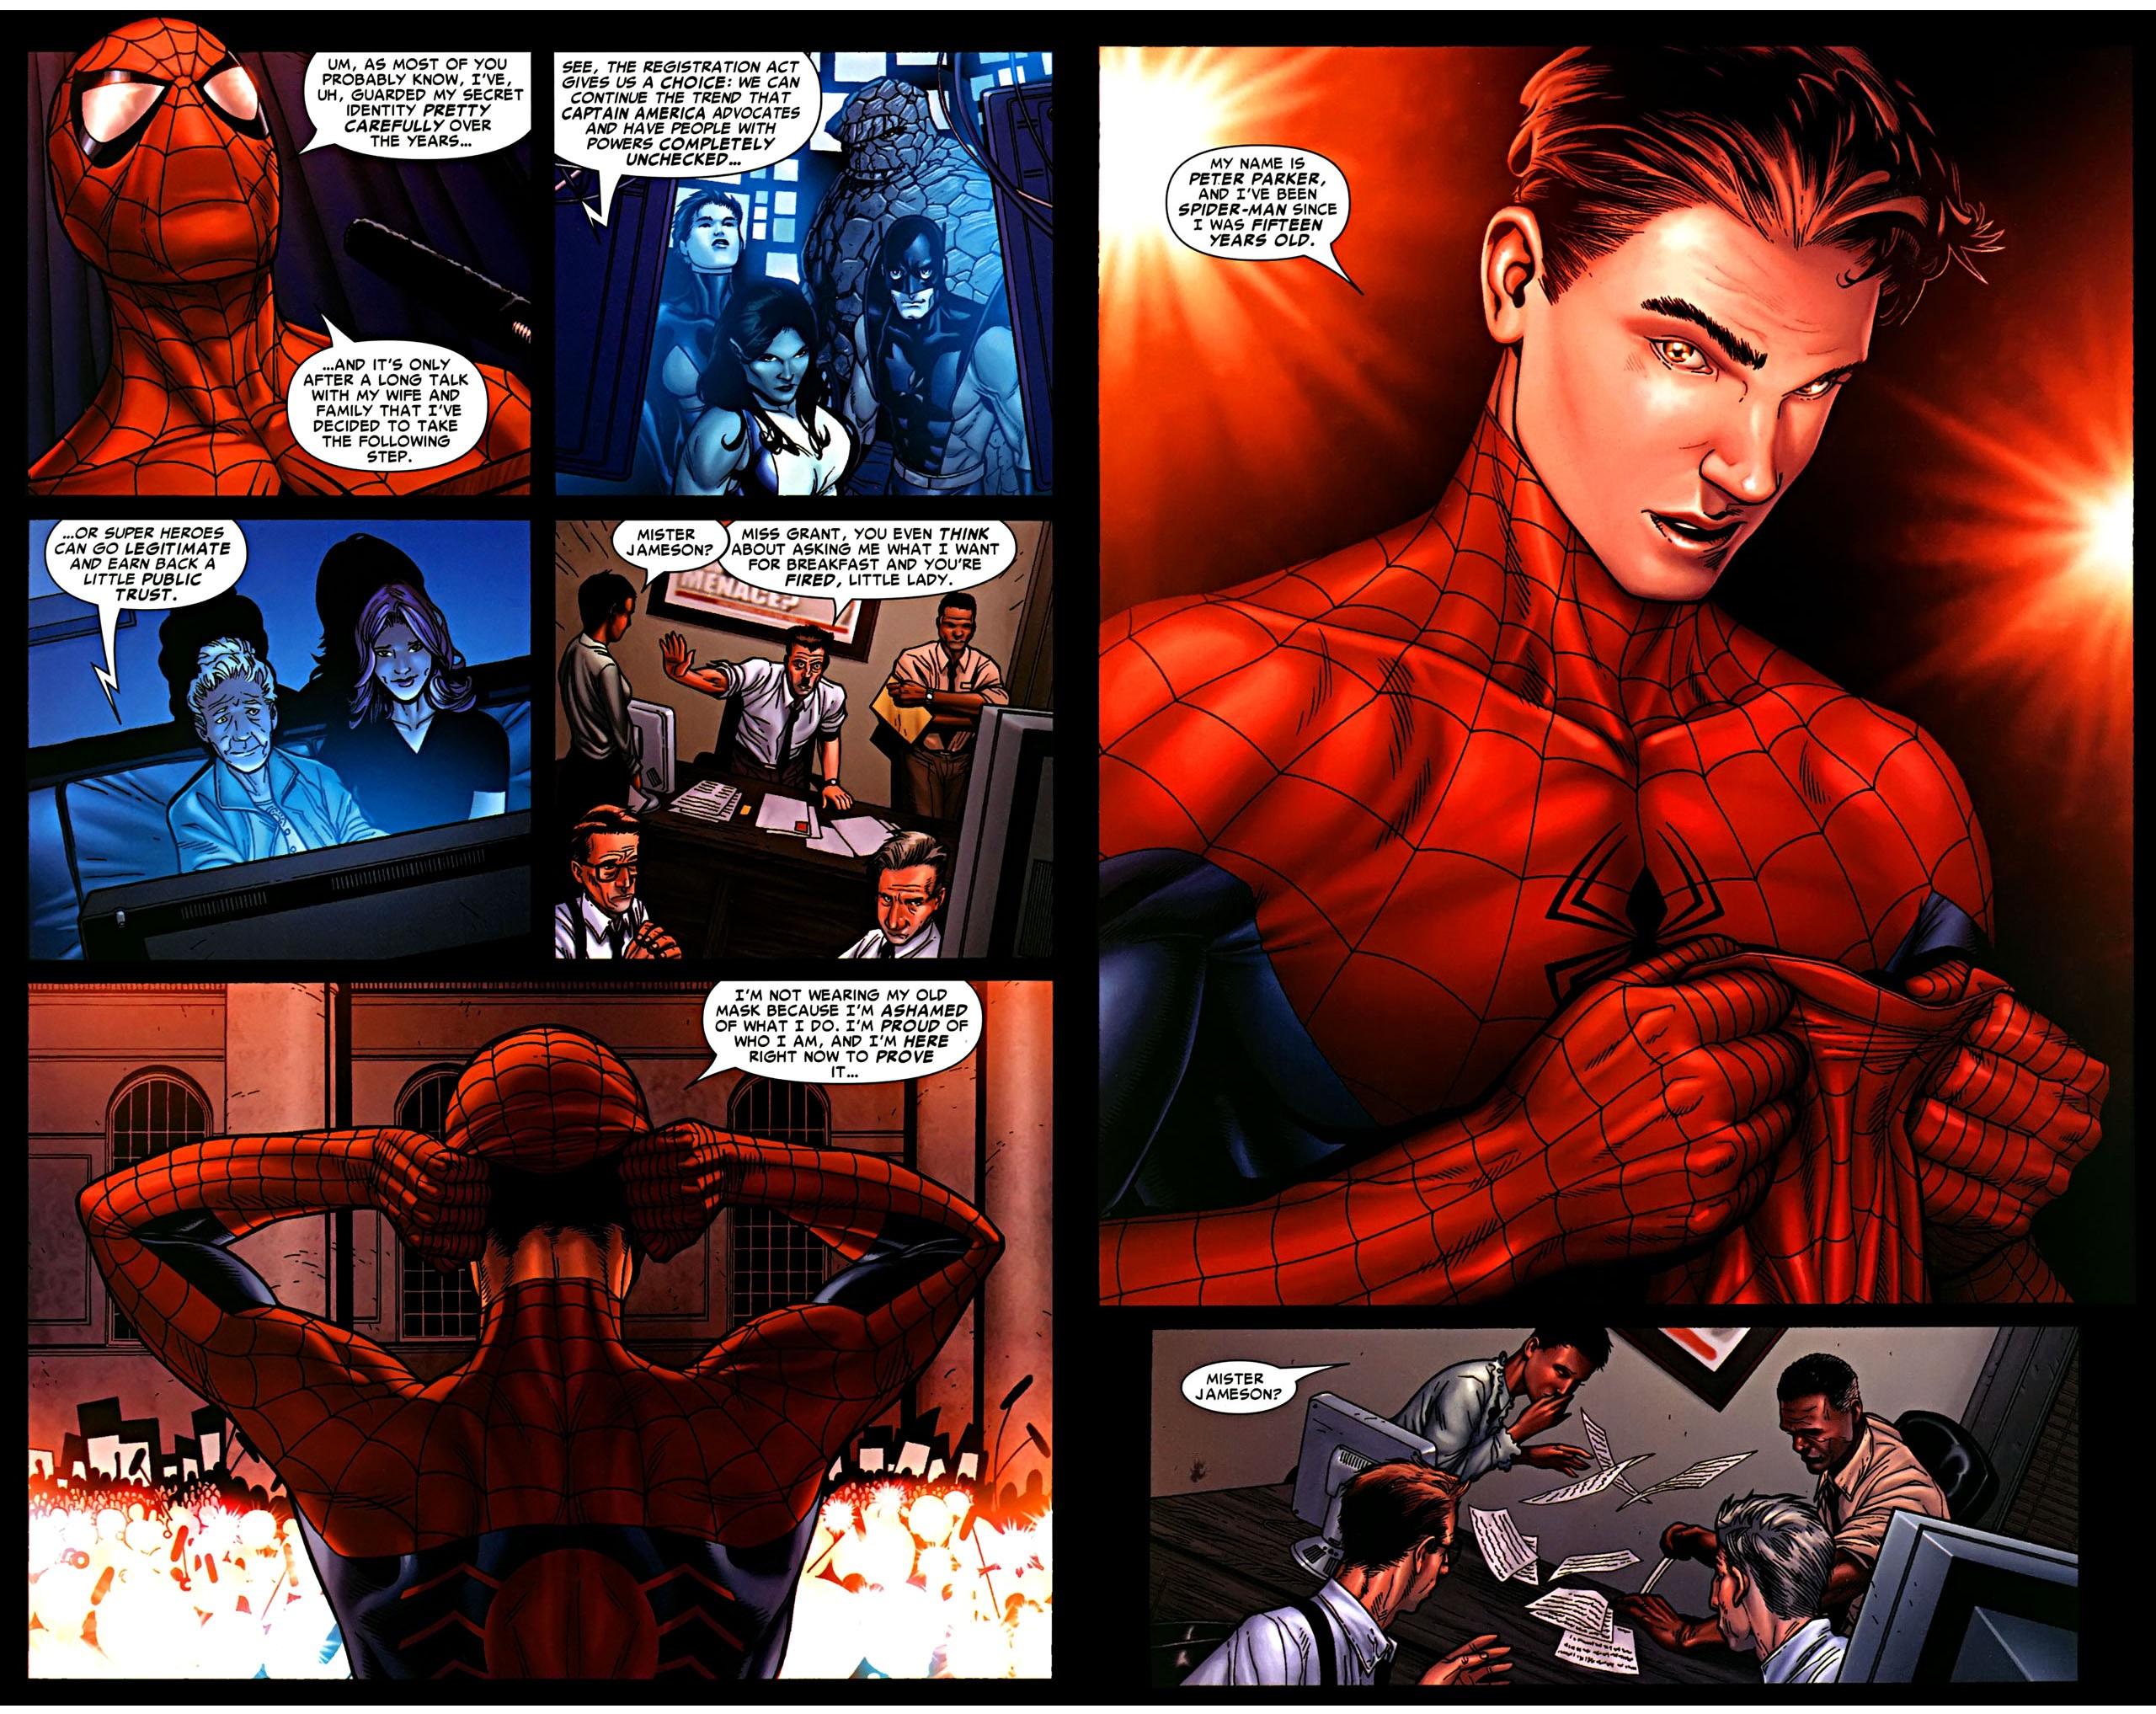 Question regarding Spidey revealing his secret identity : Marvel